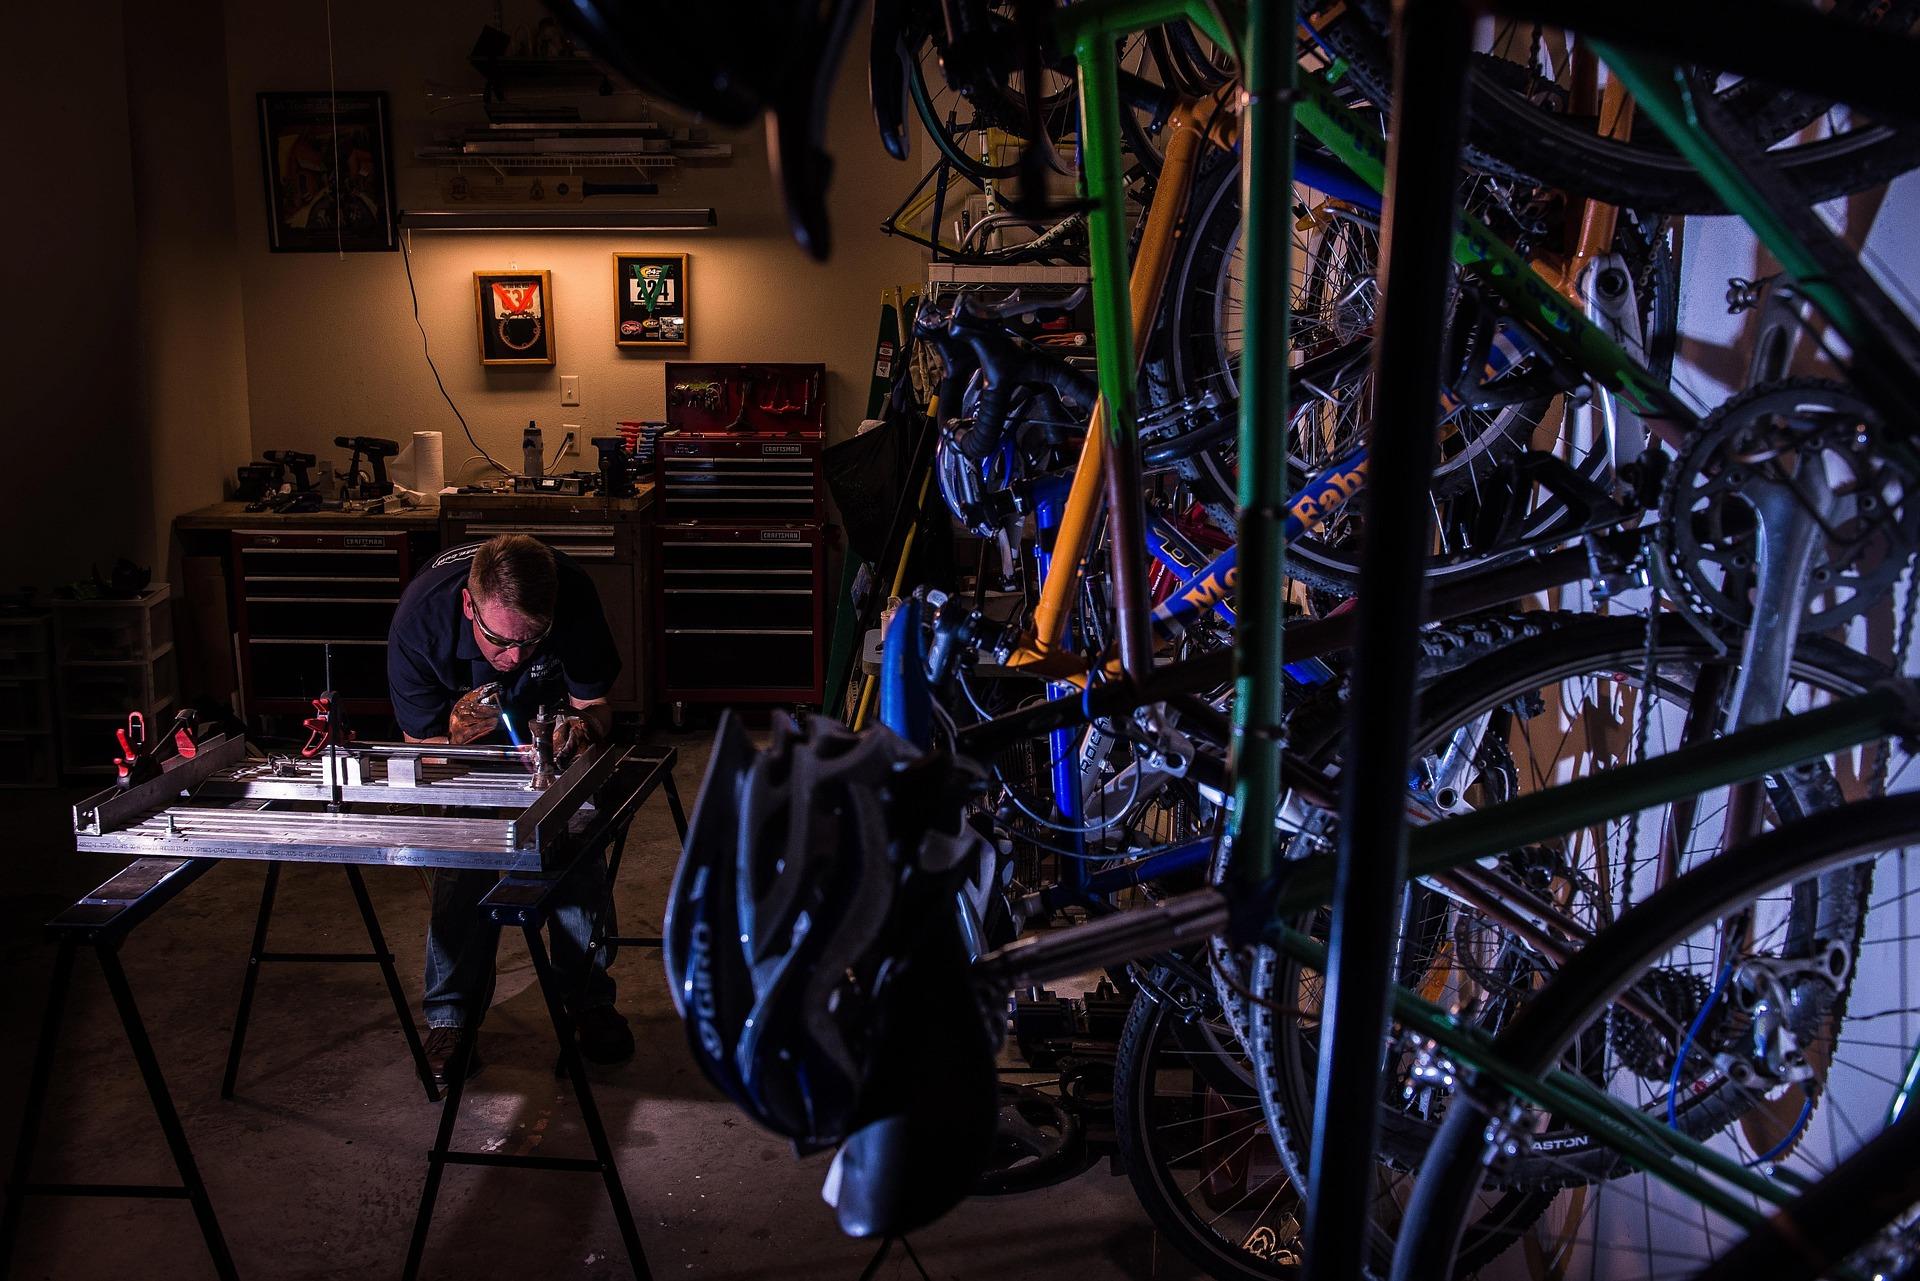 Bike mechanic photo